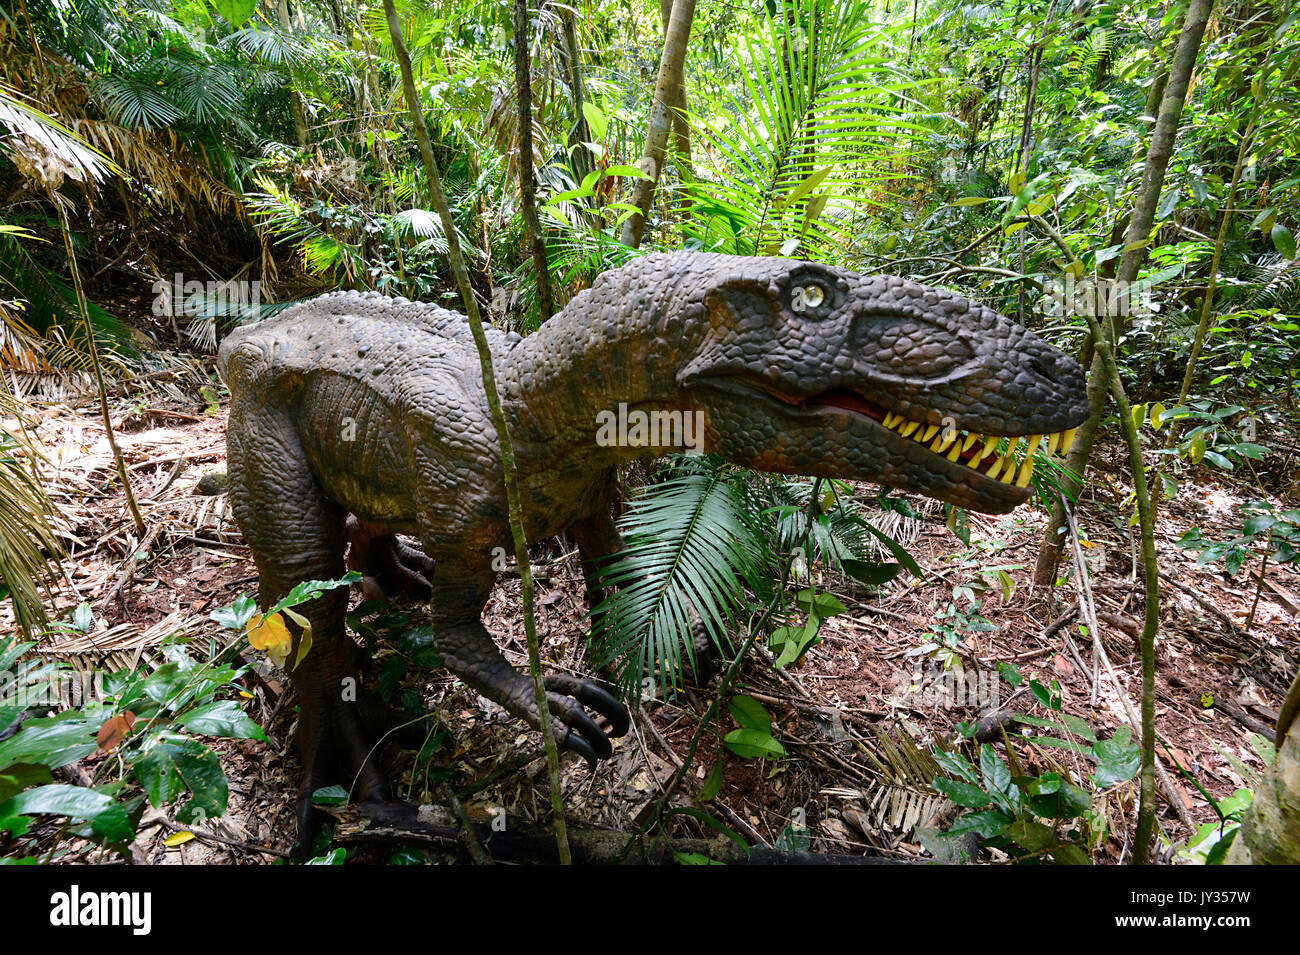 Australovenator wintonensis (Theropod) in the Jurassic Forest, Daintree Discovery Centre, QLD, Queensland, Australia - Stock Image